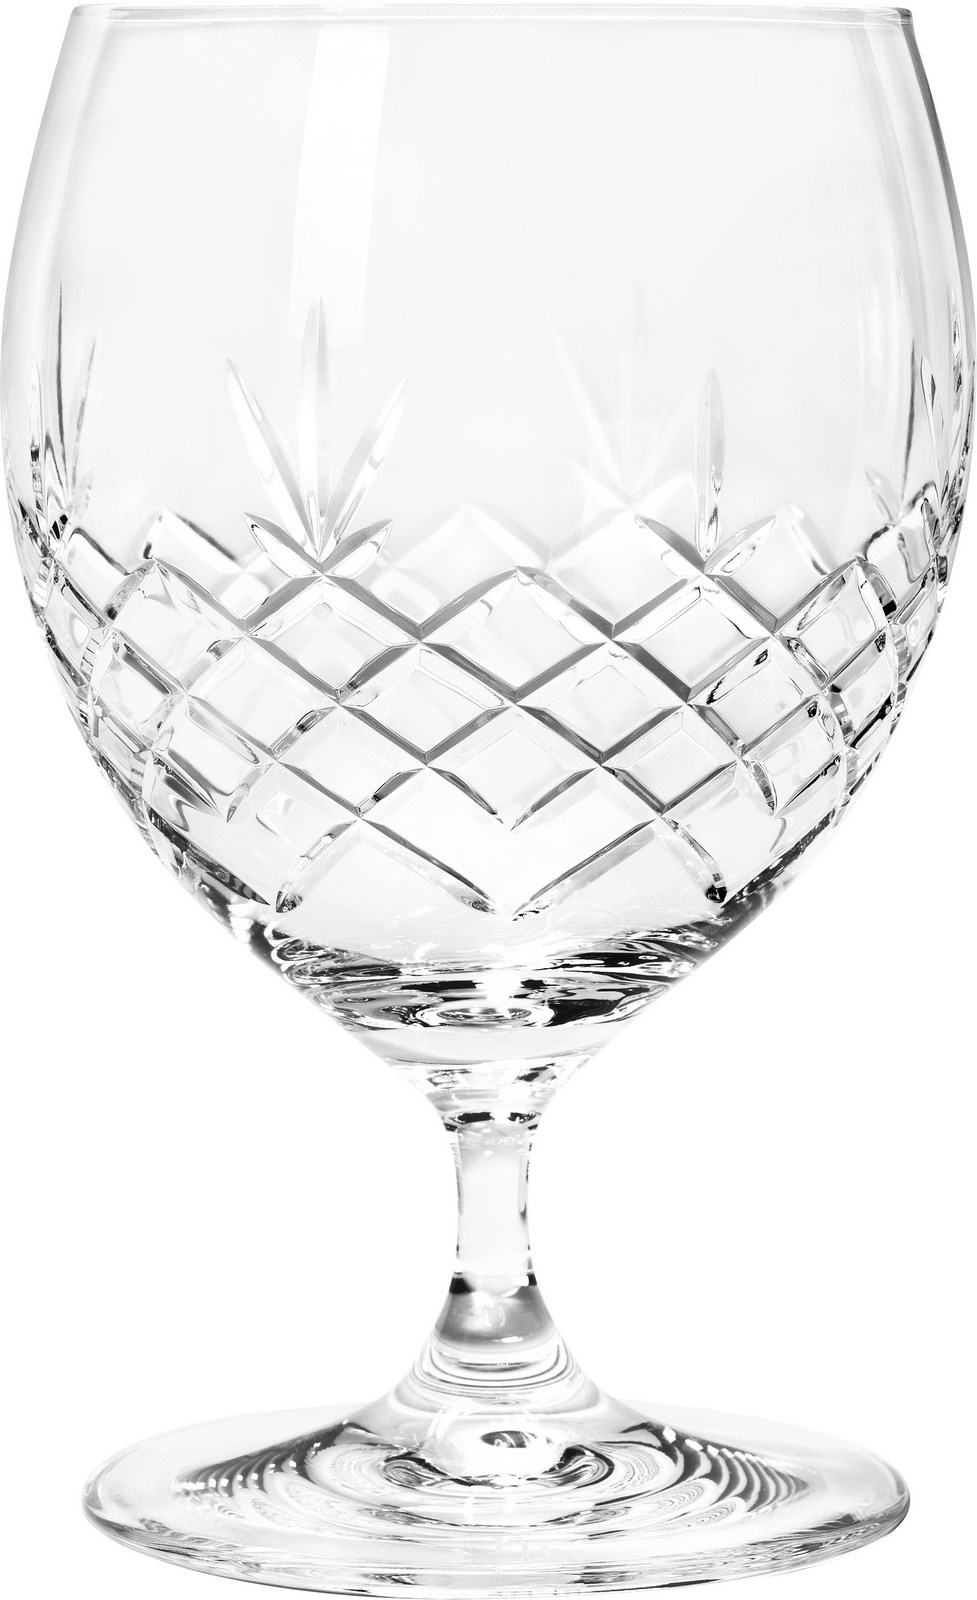 Frederik Bagger Crispy Eightball glas, 2 stk